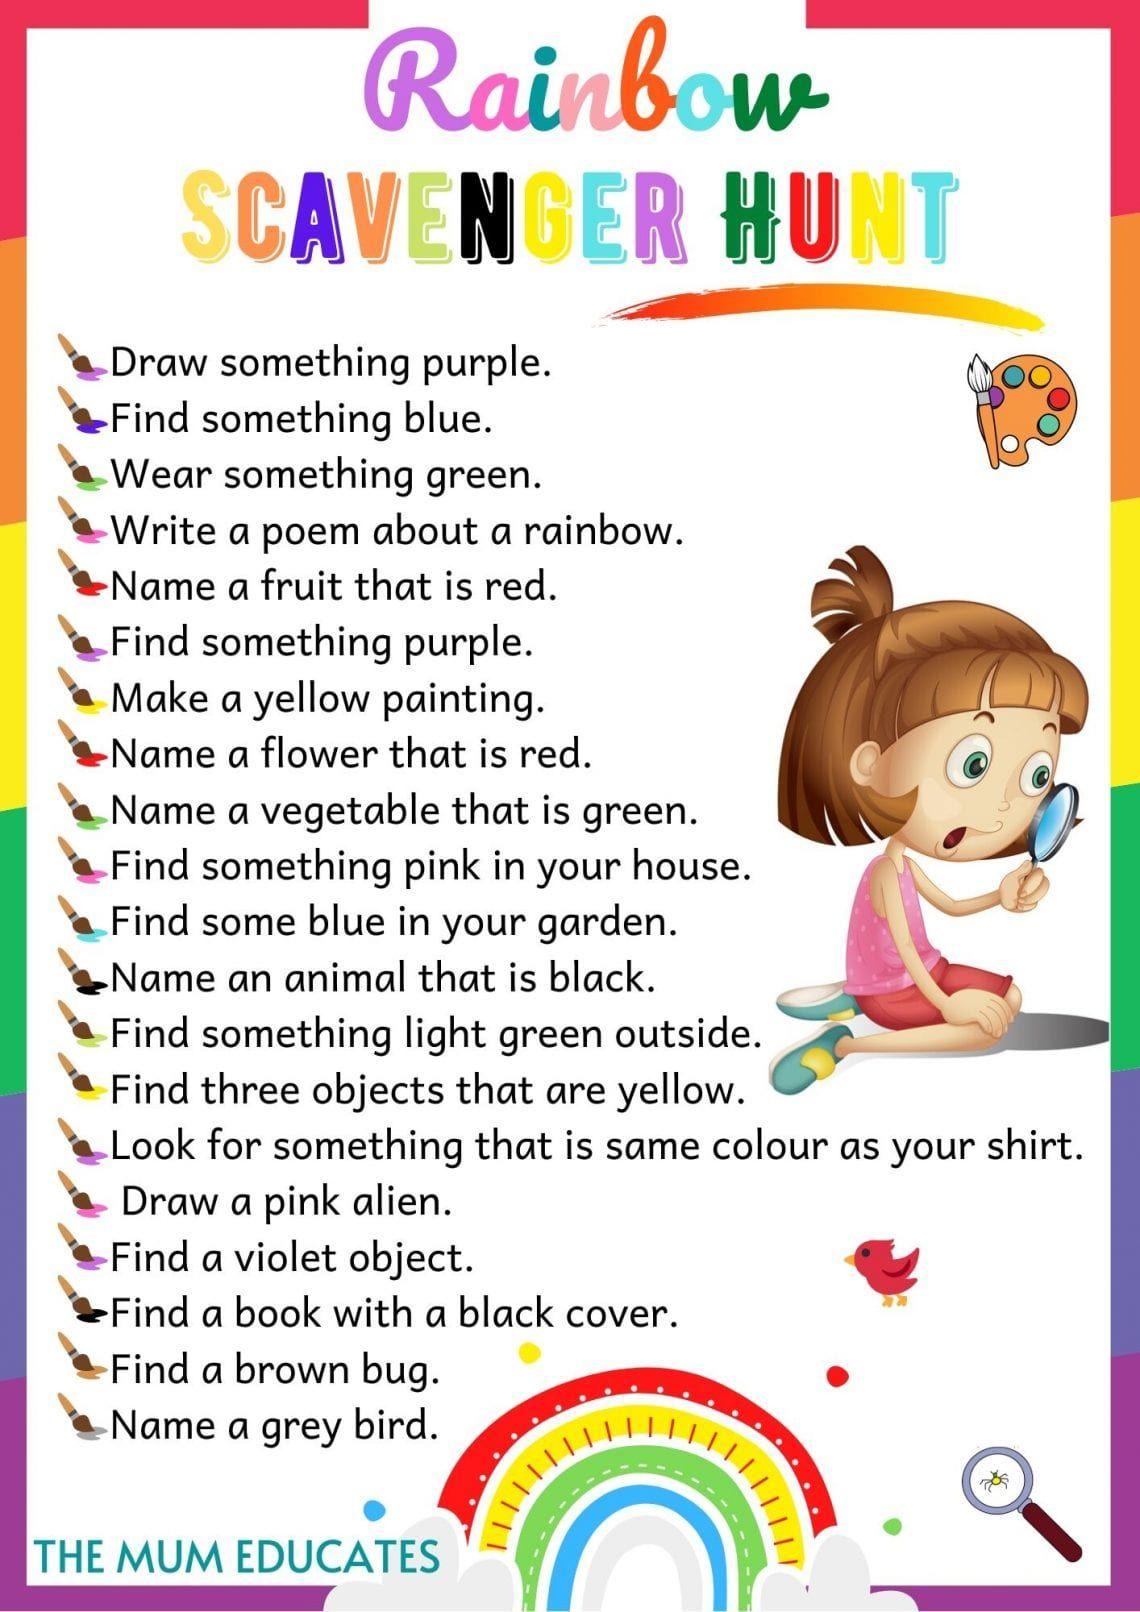 Free Printable Scavenger Hunt for Kids Ideas The Mum